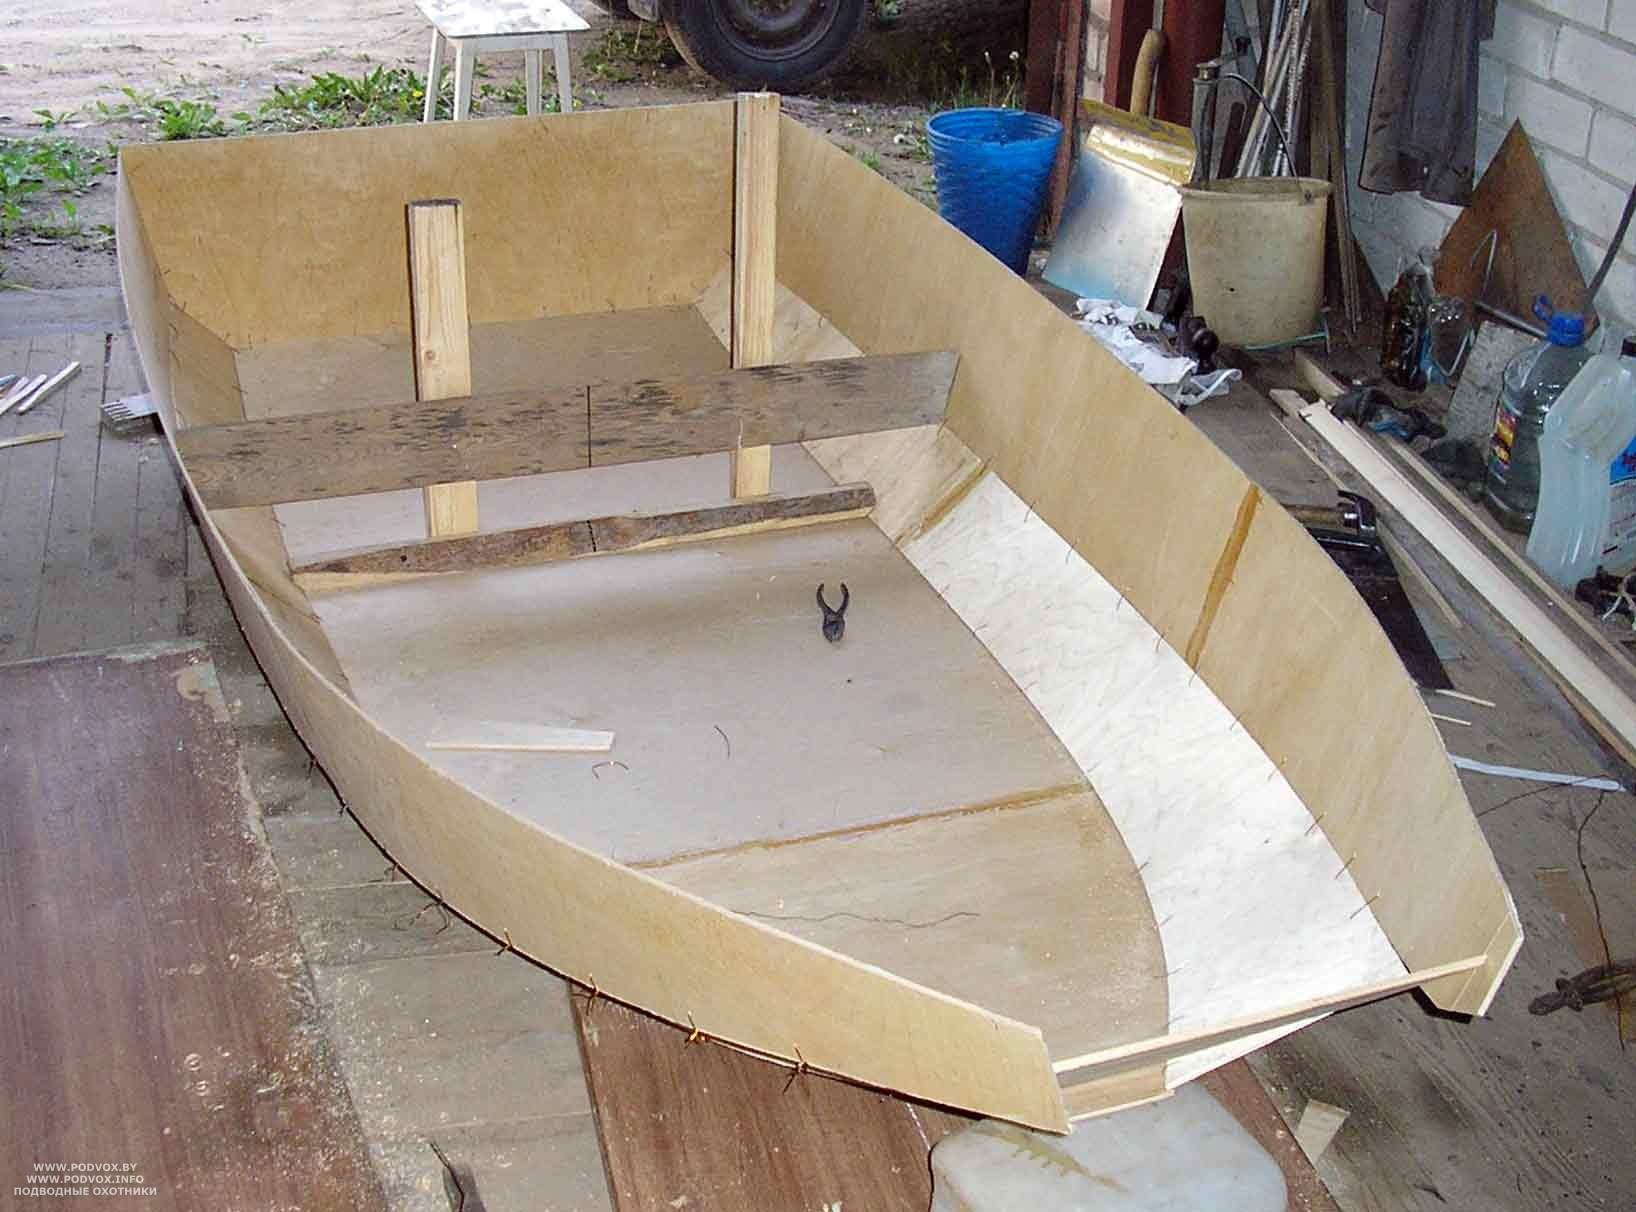 Сделайте лодку, яхту или катер своими руками 68